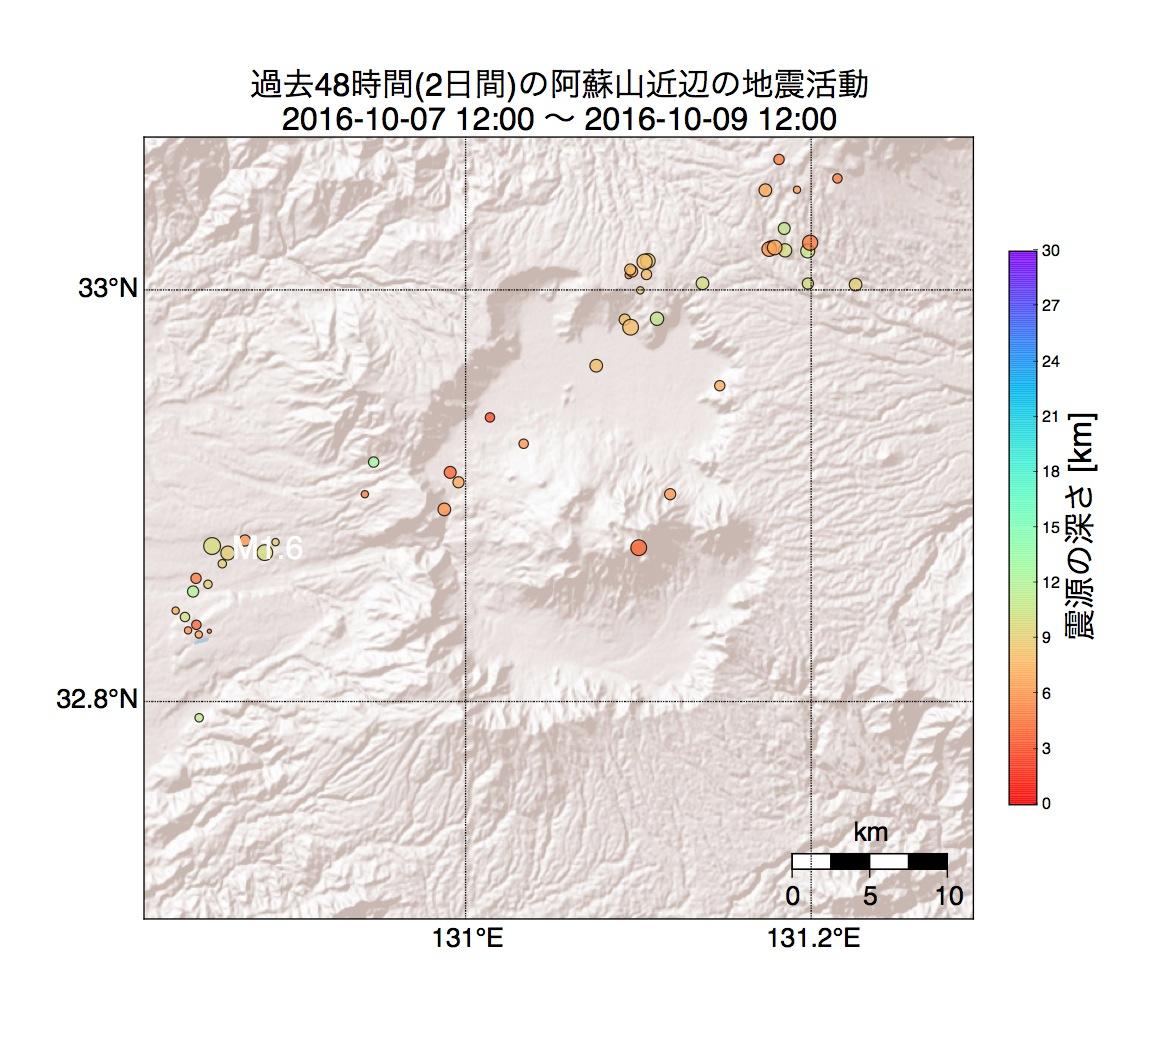 http://jishin.chamu.org/aso/20161009_1.jpg